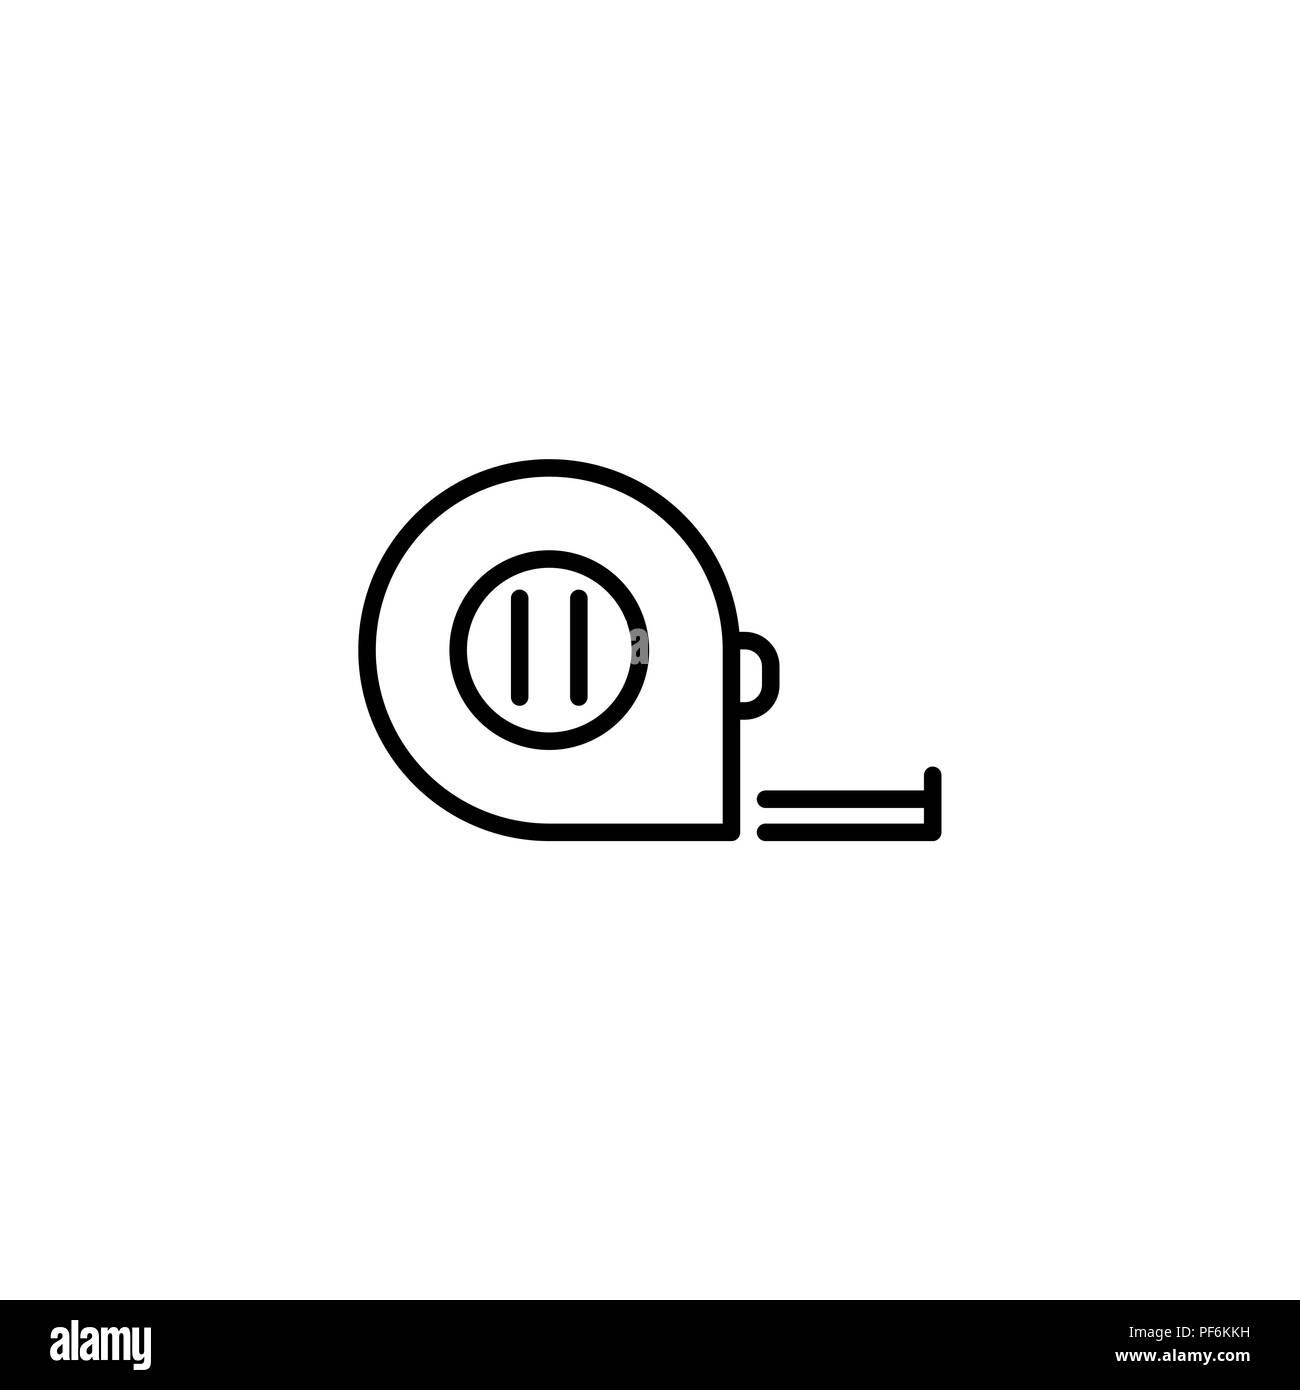 Web line icon. Tape measure black on white background - Stock Image